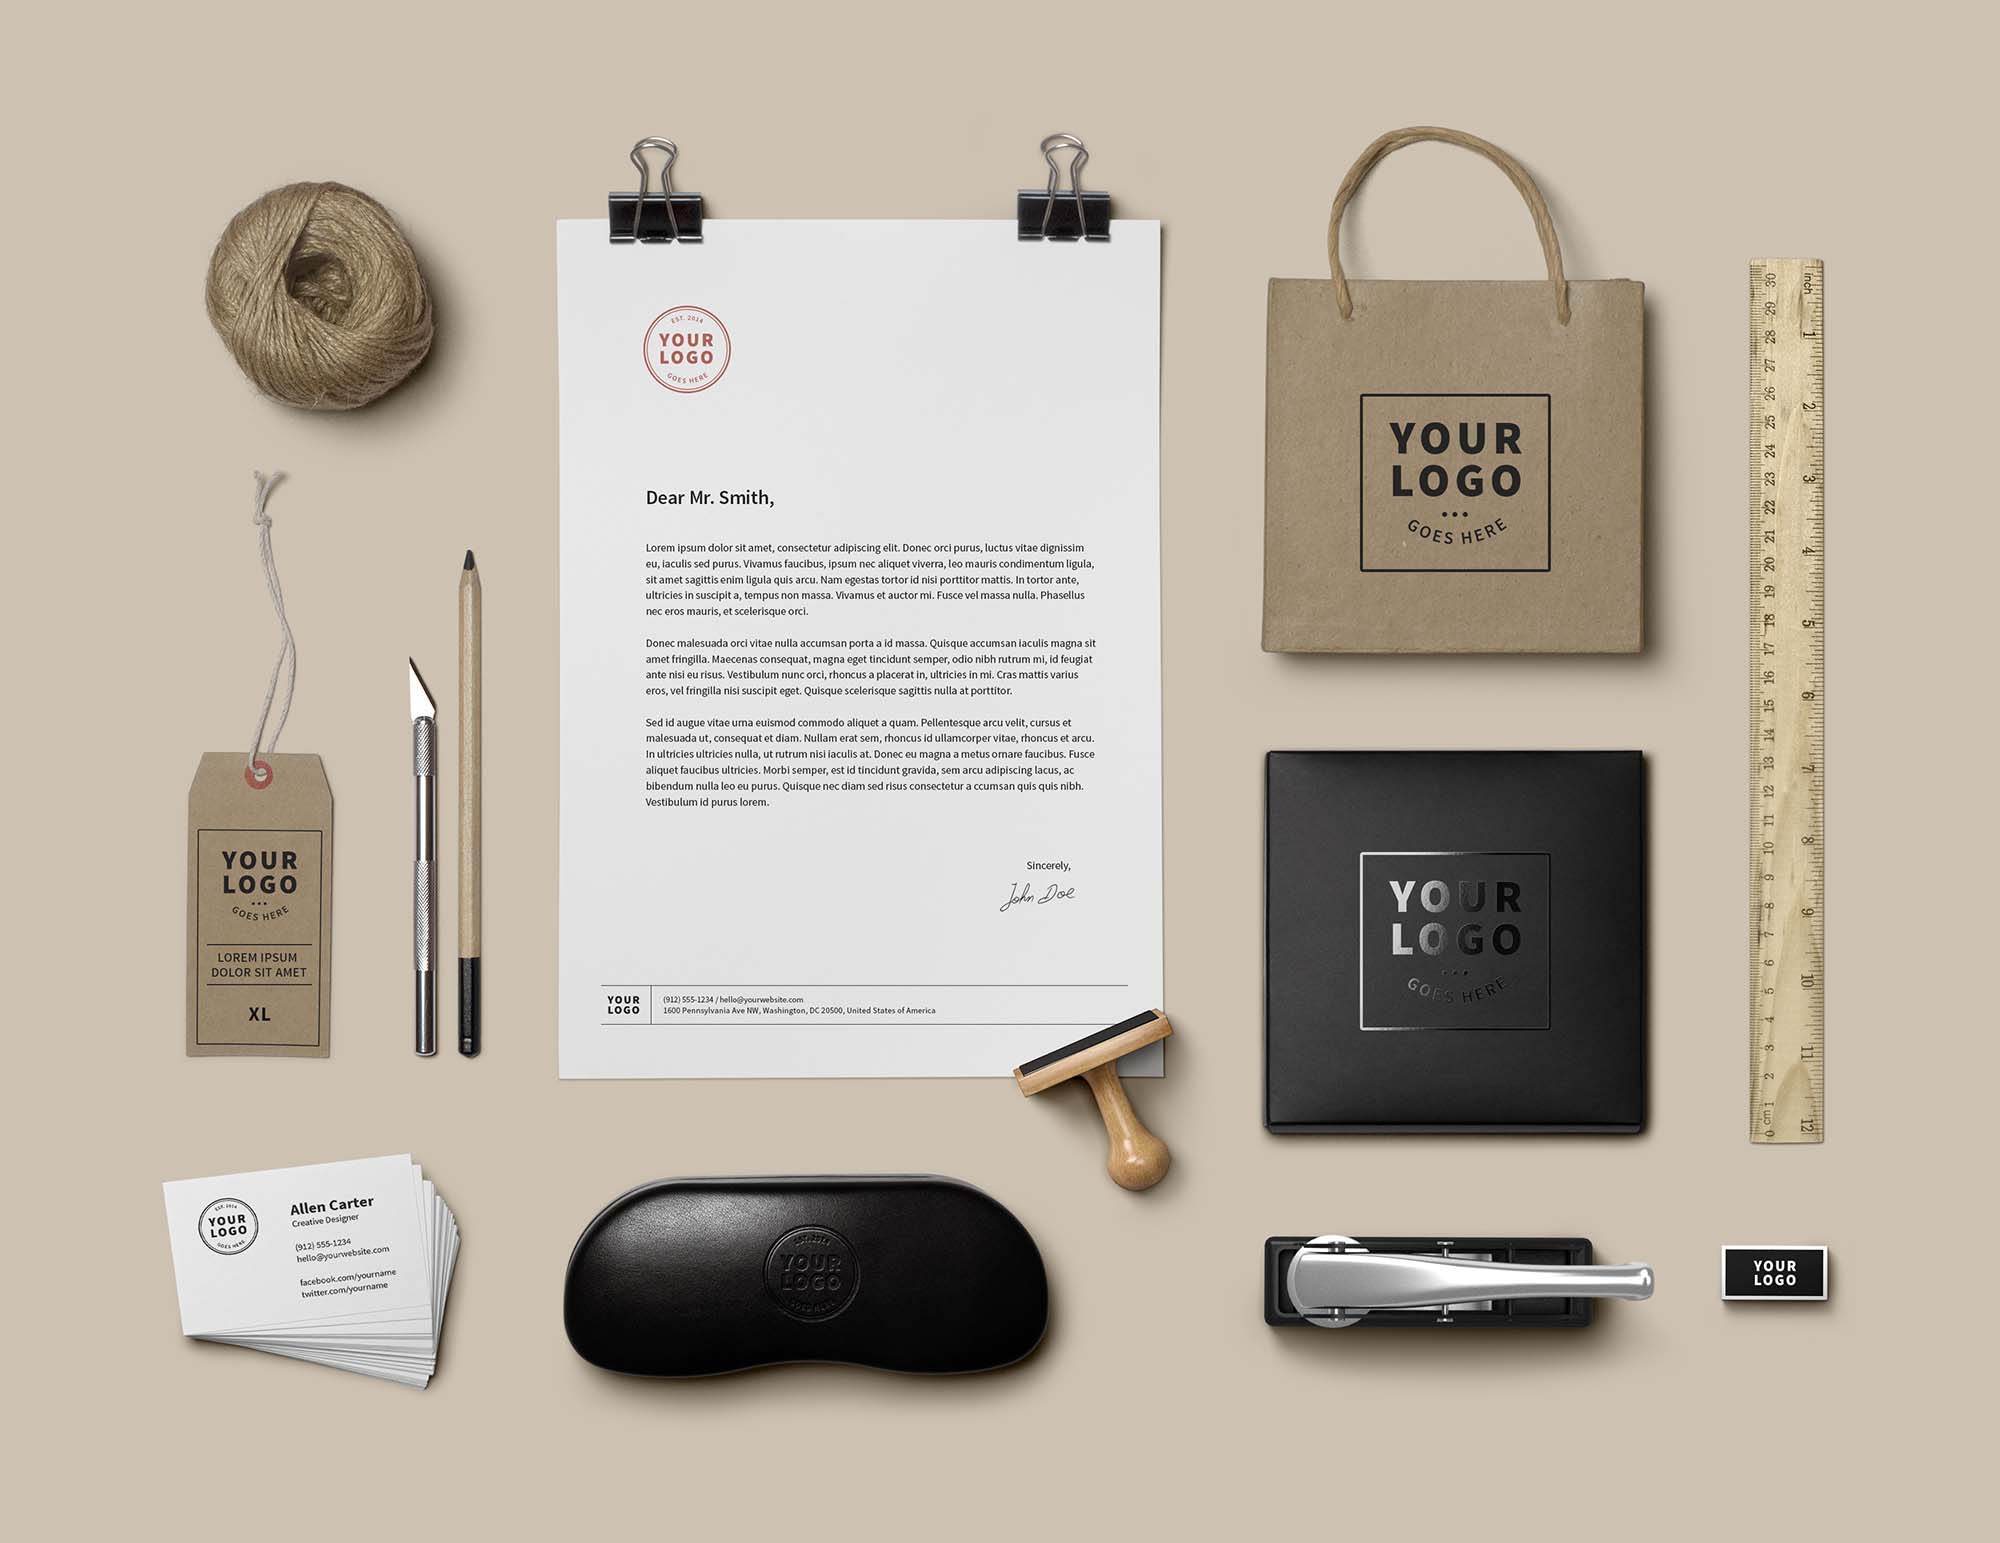 Branding and Identity Mockup PSD